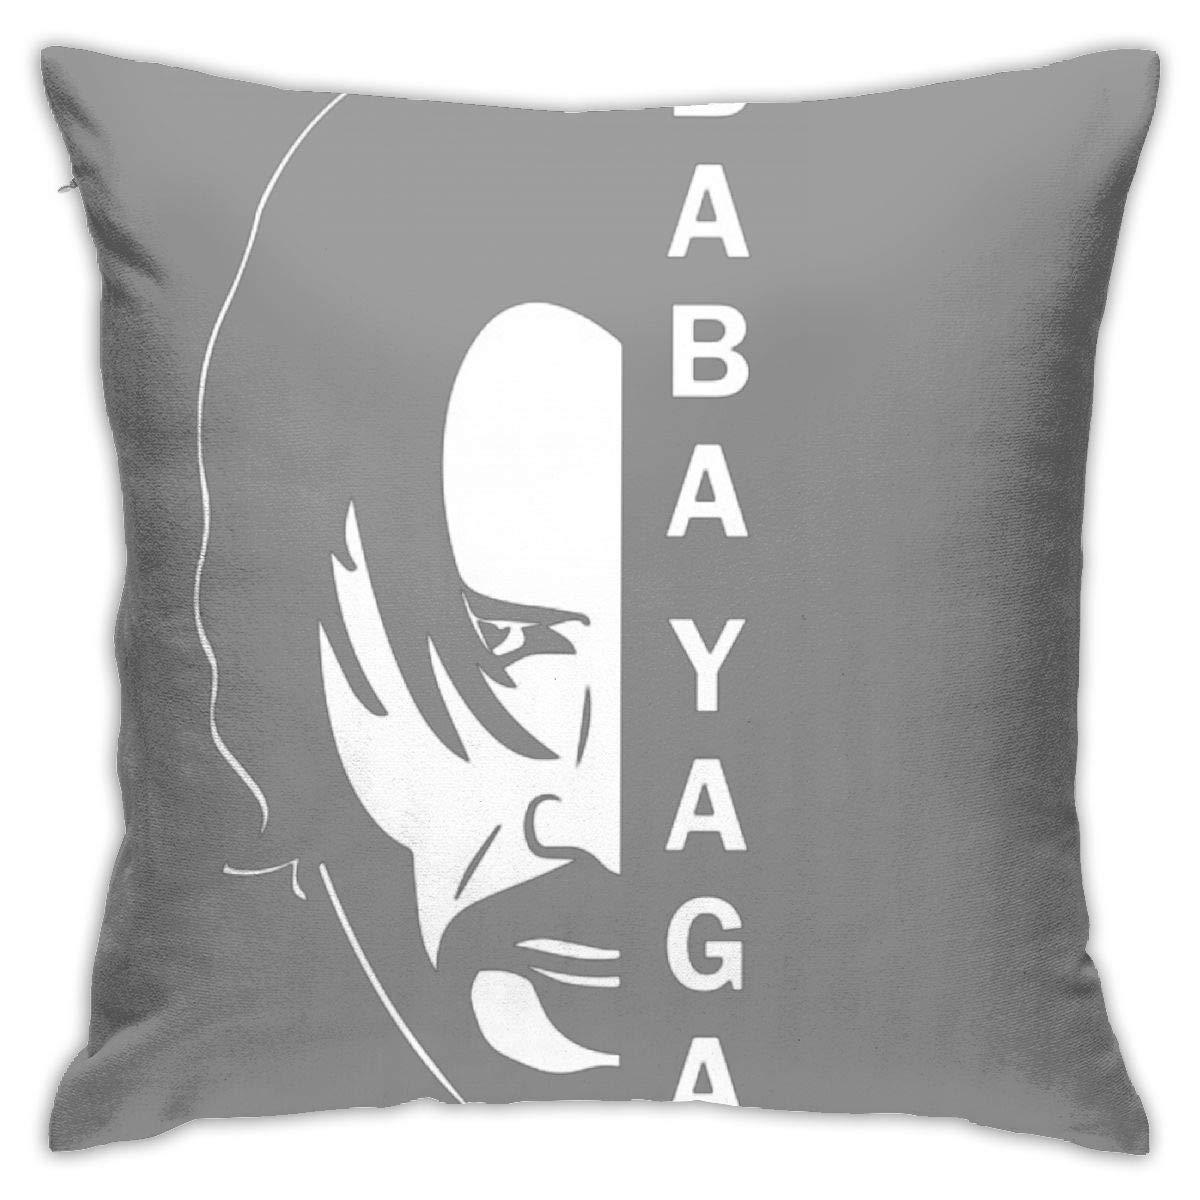 No Inserts Included fdgjfghjdfj Baba Yaga/&John Wick Pillow 18inch*18inch,Cushion Pillowcase Decorative Square Sofa Bedroom Car